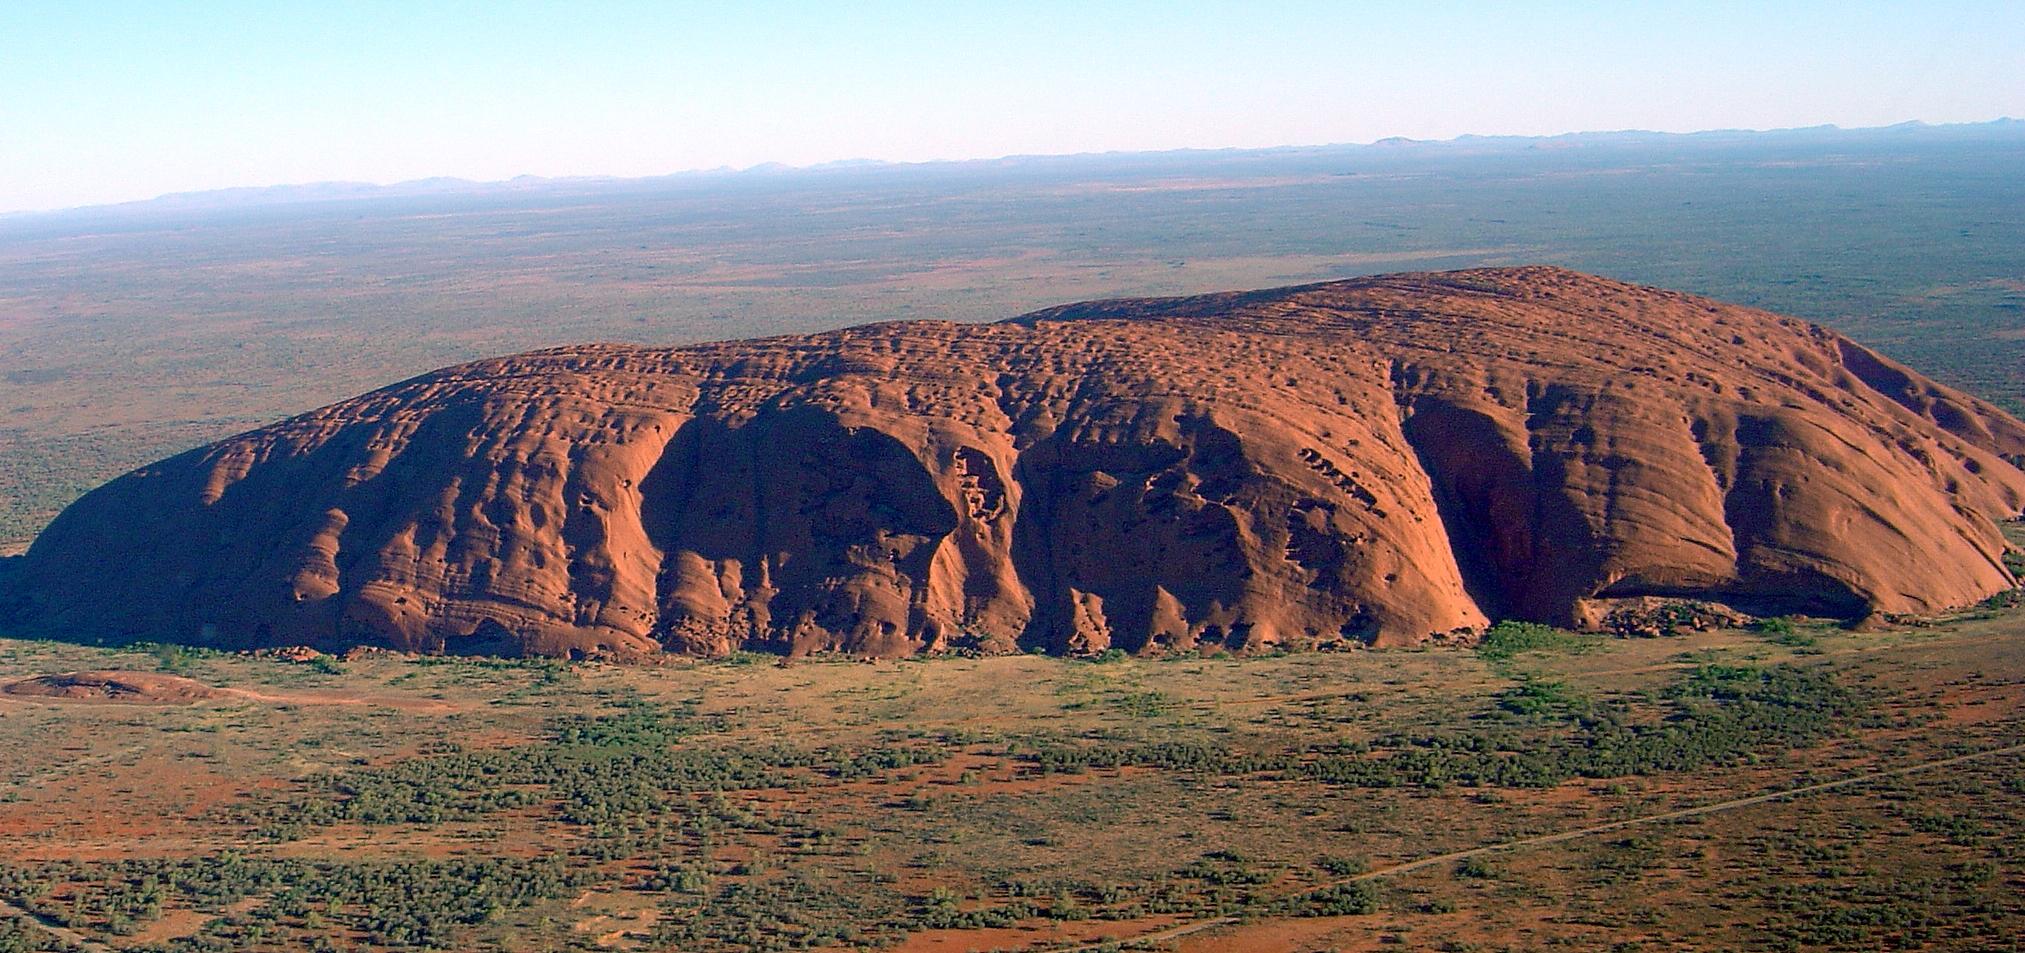 Source: https://commons.wikimedia.org/wiki/File:Uluru_(Helicopter_view)-crop.jpg